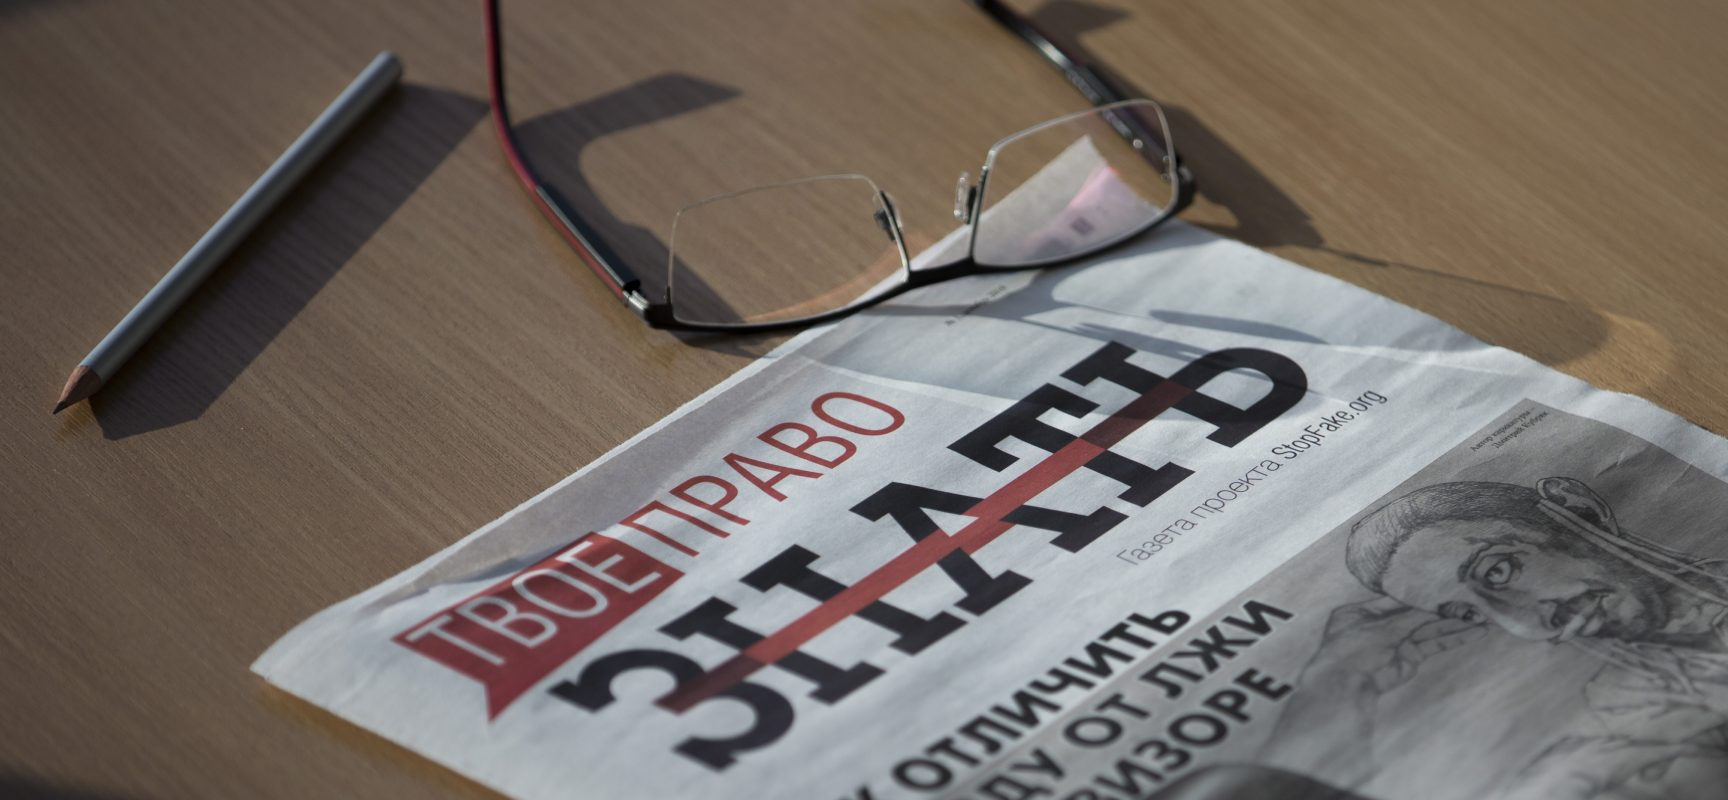 StopFake lancia un mensile cartaceo per il Donbas